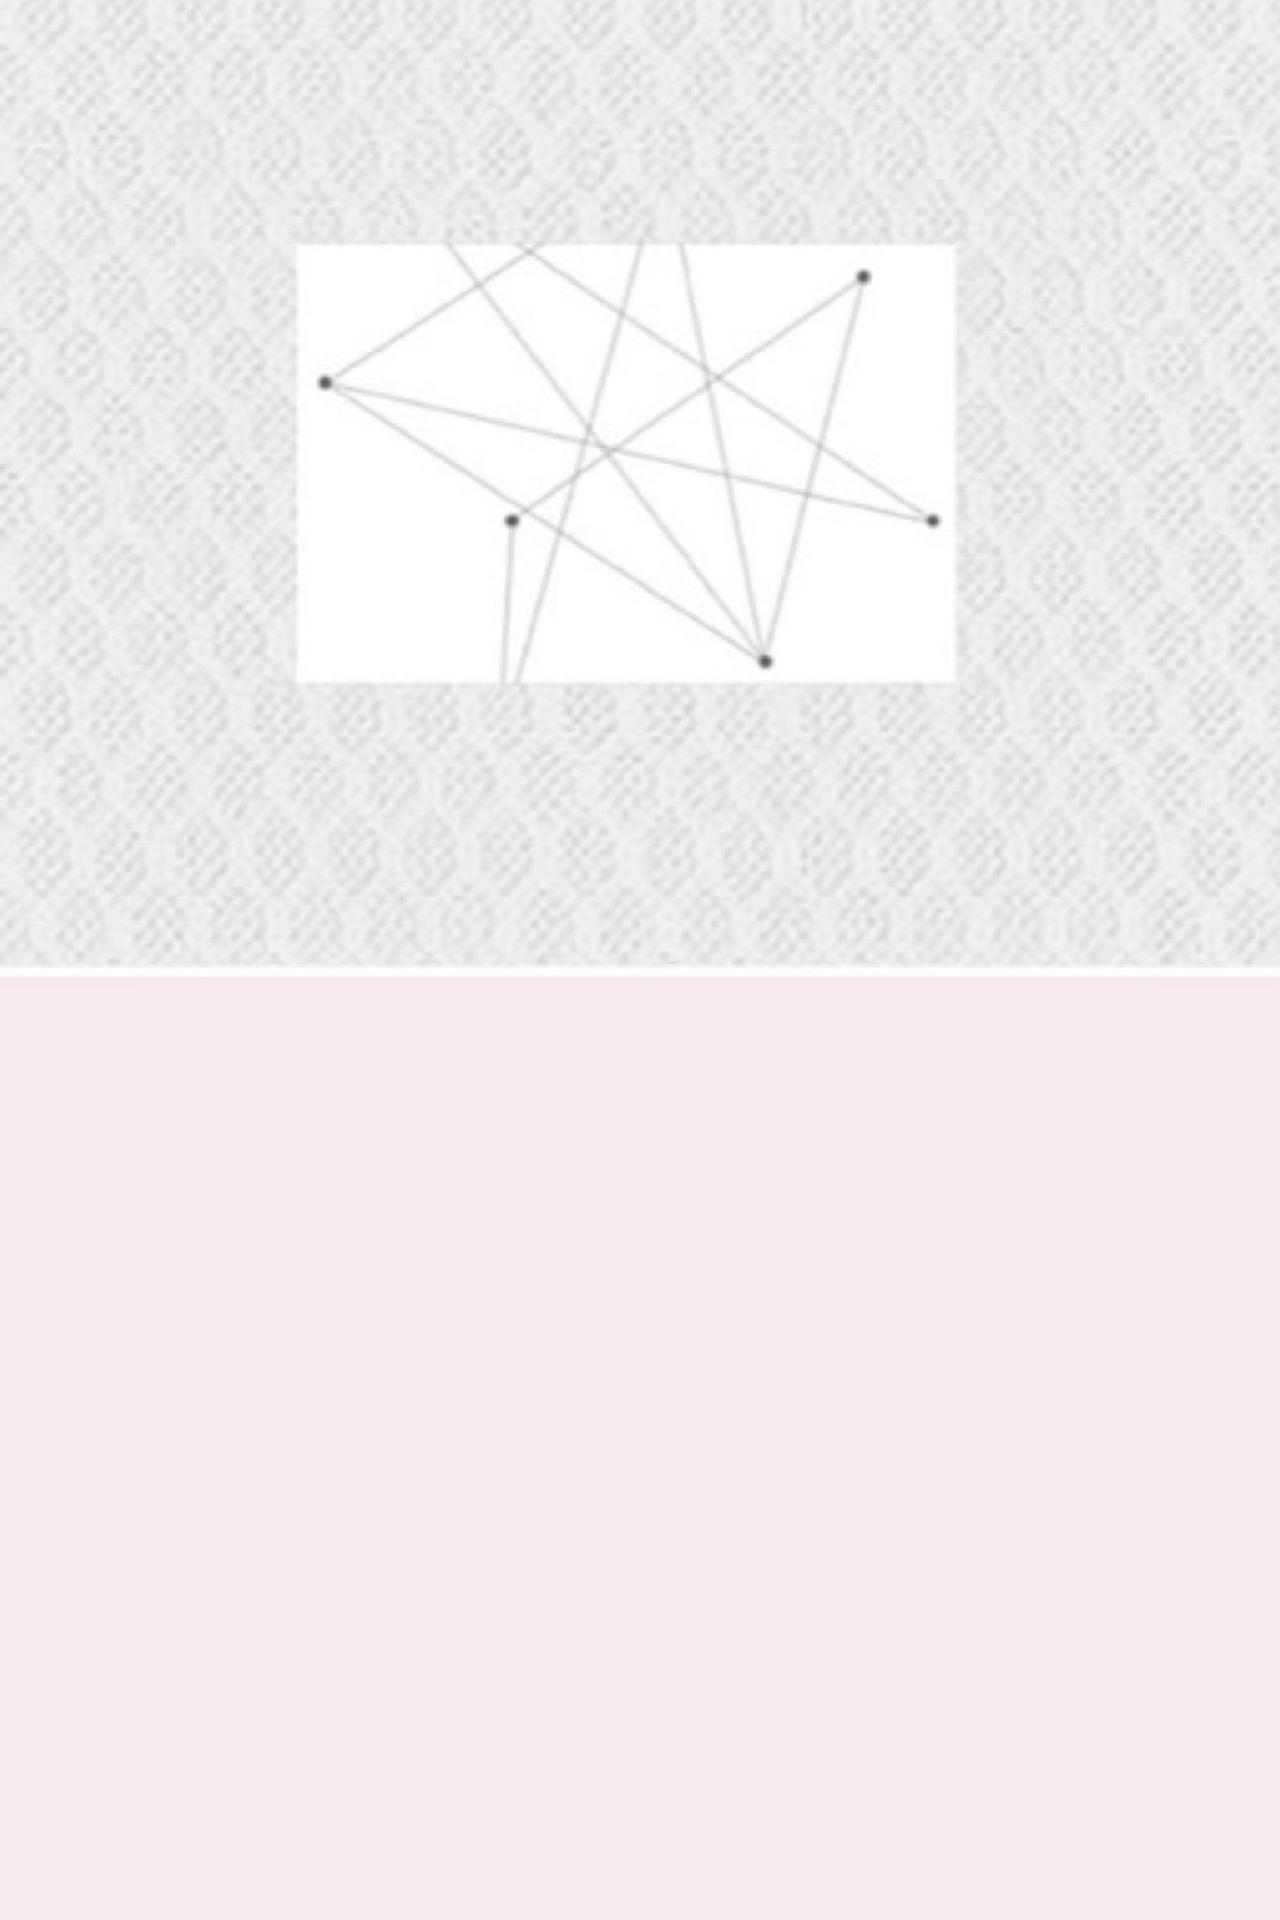 35 Latest Aesthetic Overlay Aesthetic Book Cover Template Strike Dear Mistresss